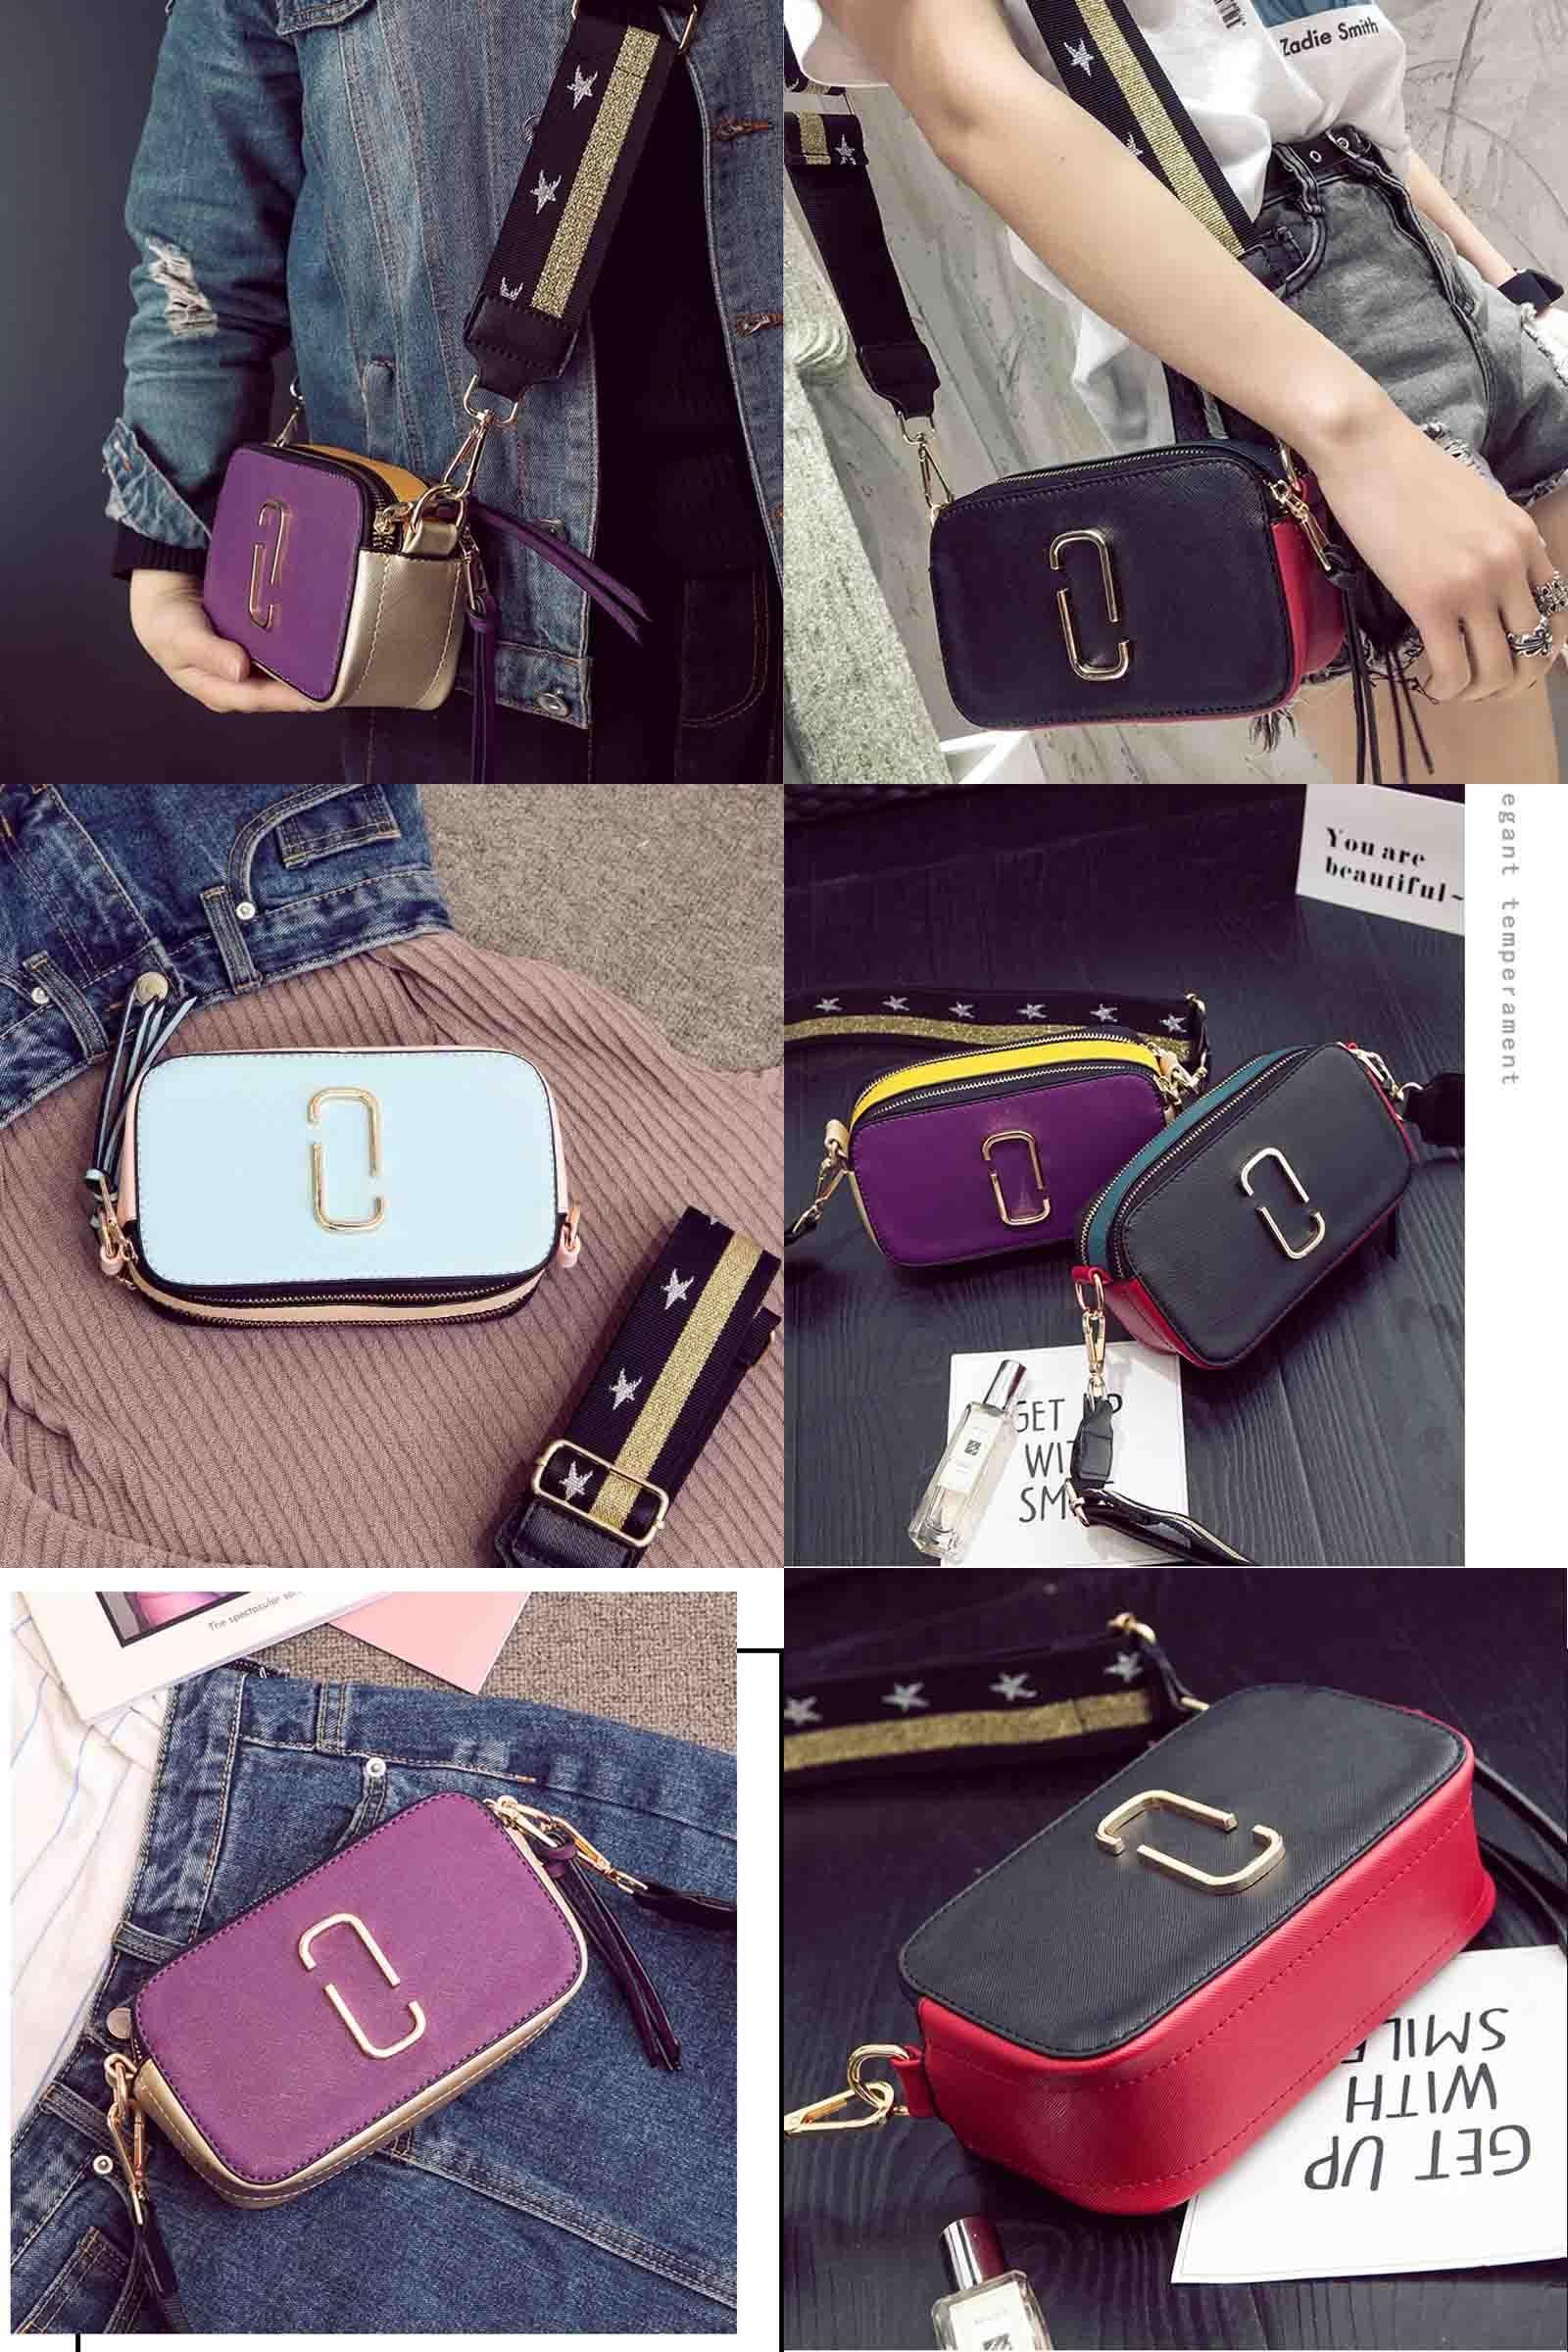 Visit To Buy 2017 Famous Designer Brand Small Shoulder Bags Women Pop Italian Leather Handbags Shoulder Bag Women Small Shoulder Bag Italian Leather Handbags